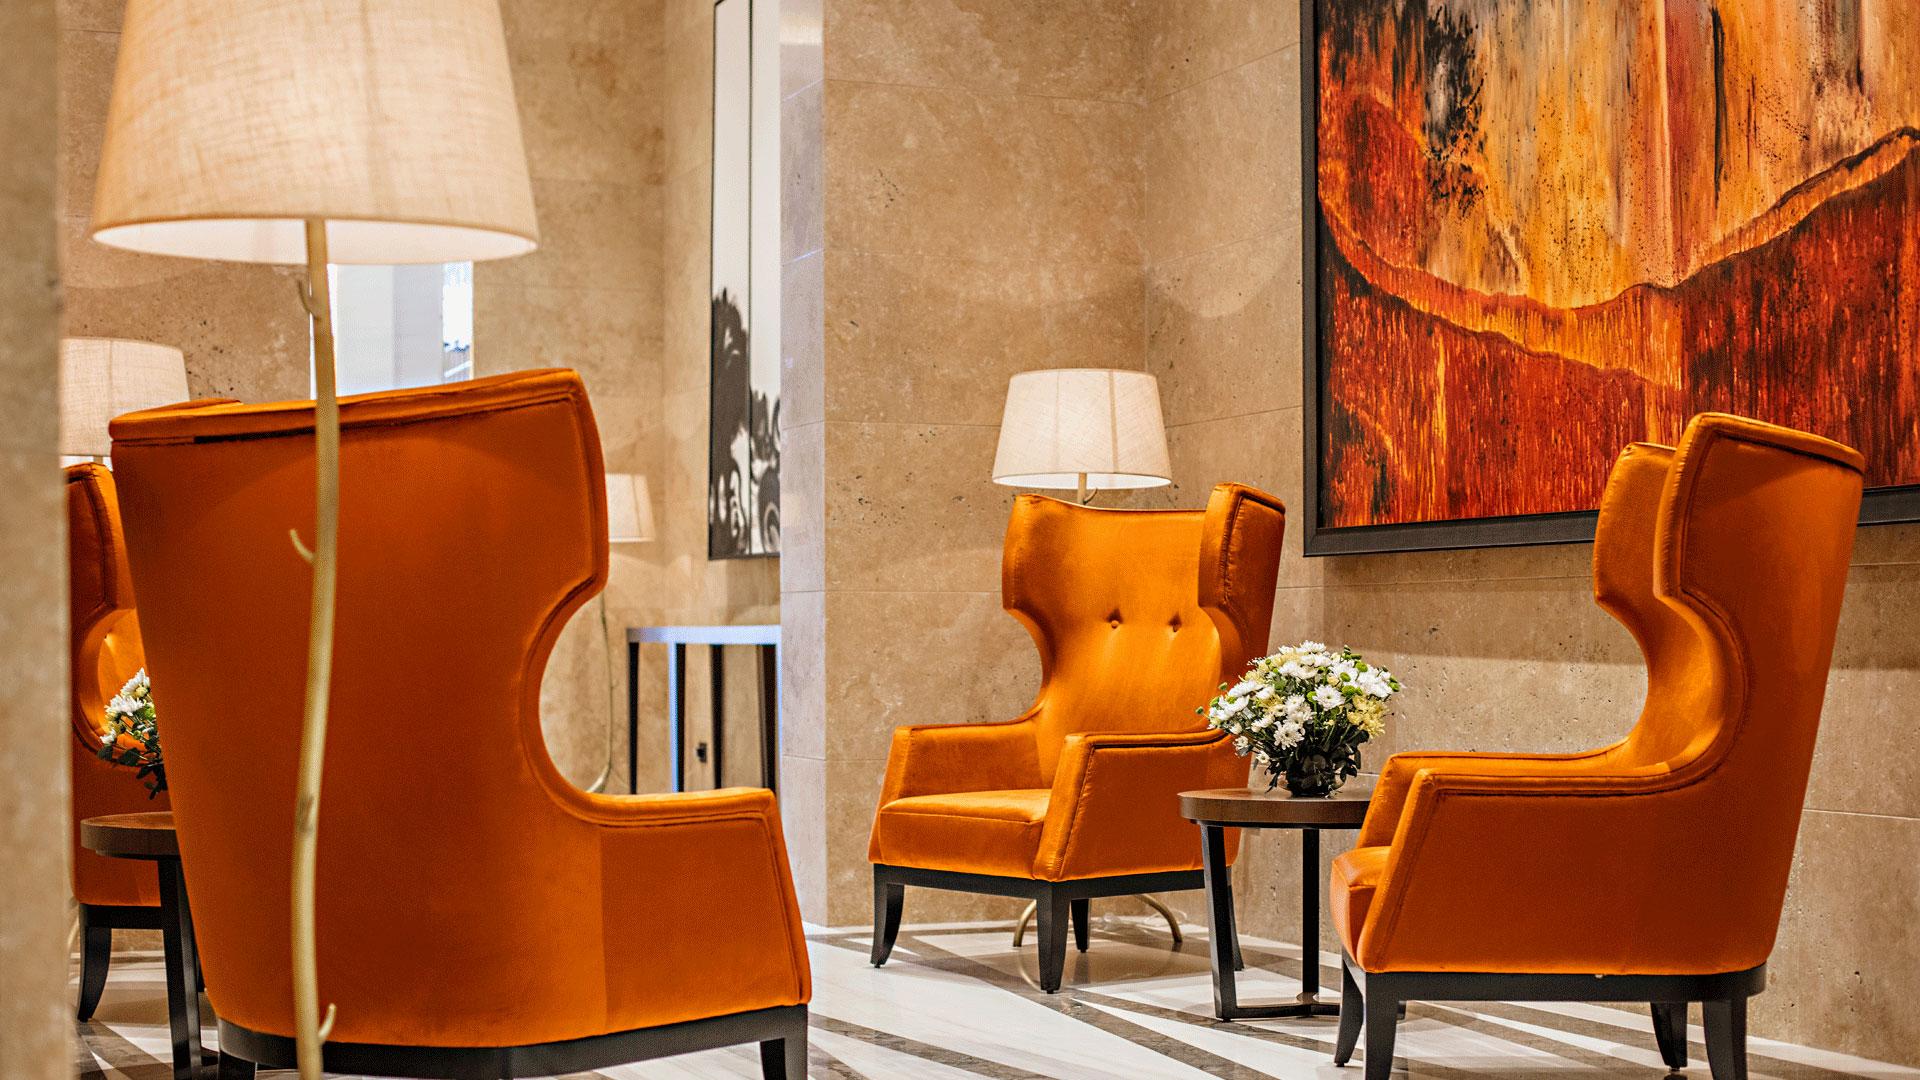 Luxurious 4BHK flat in Ulsoor